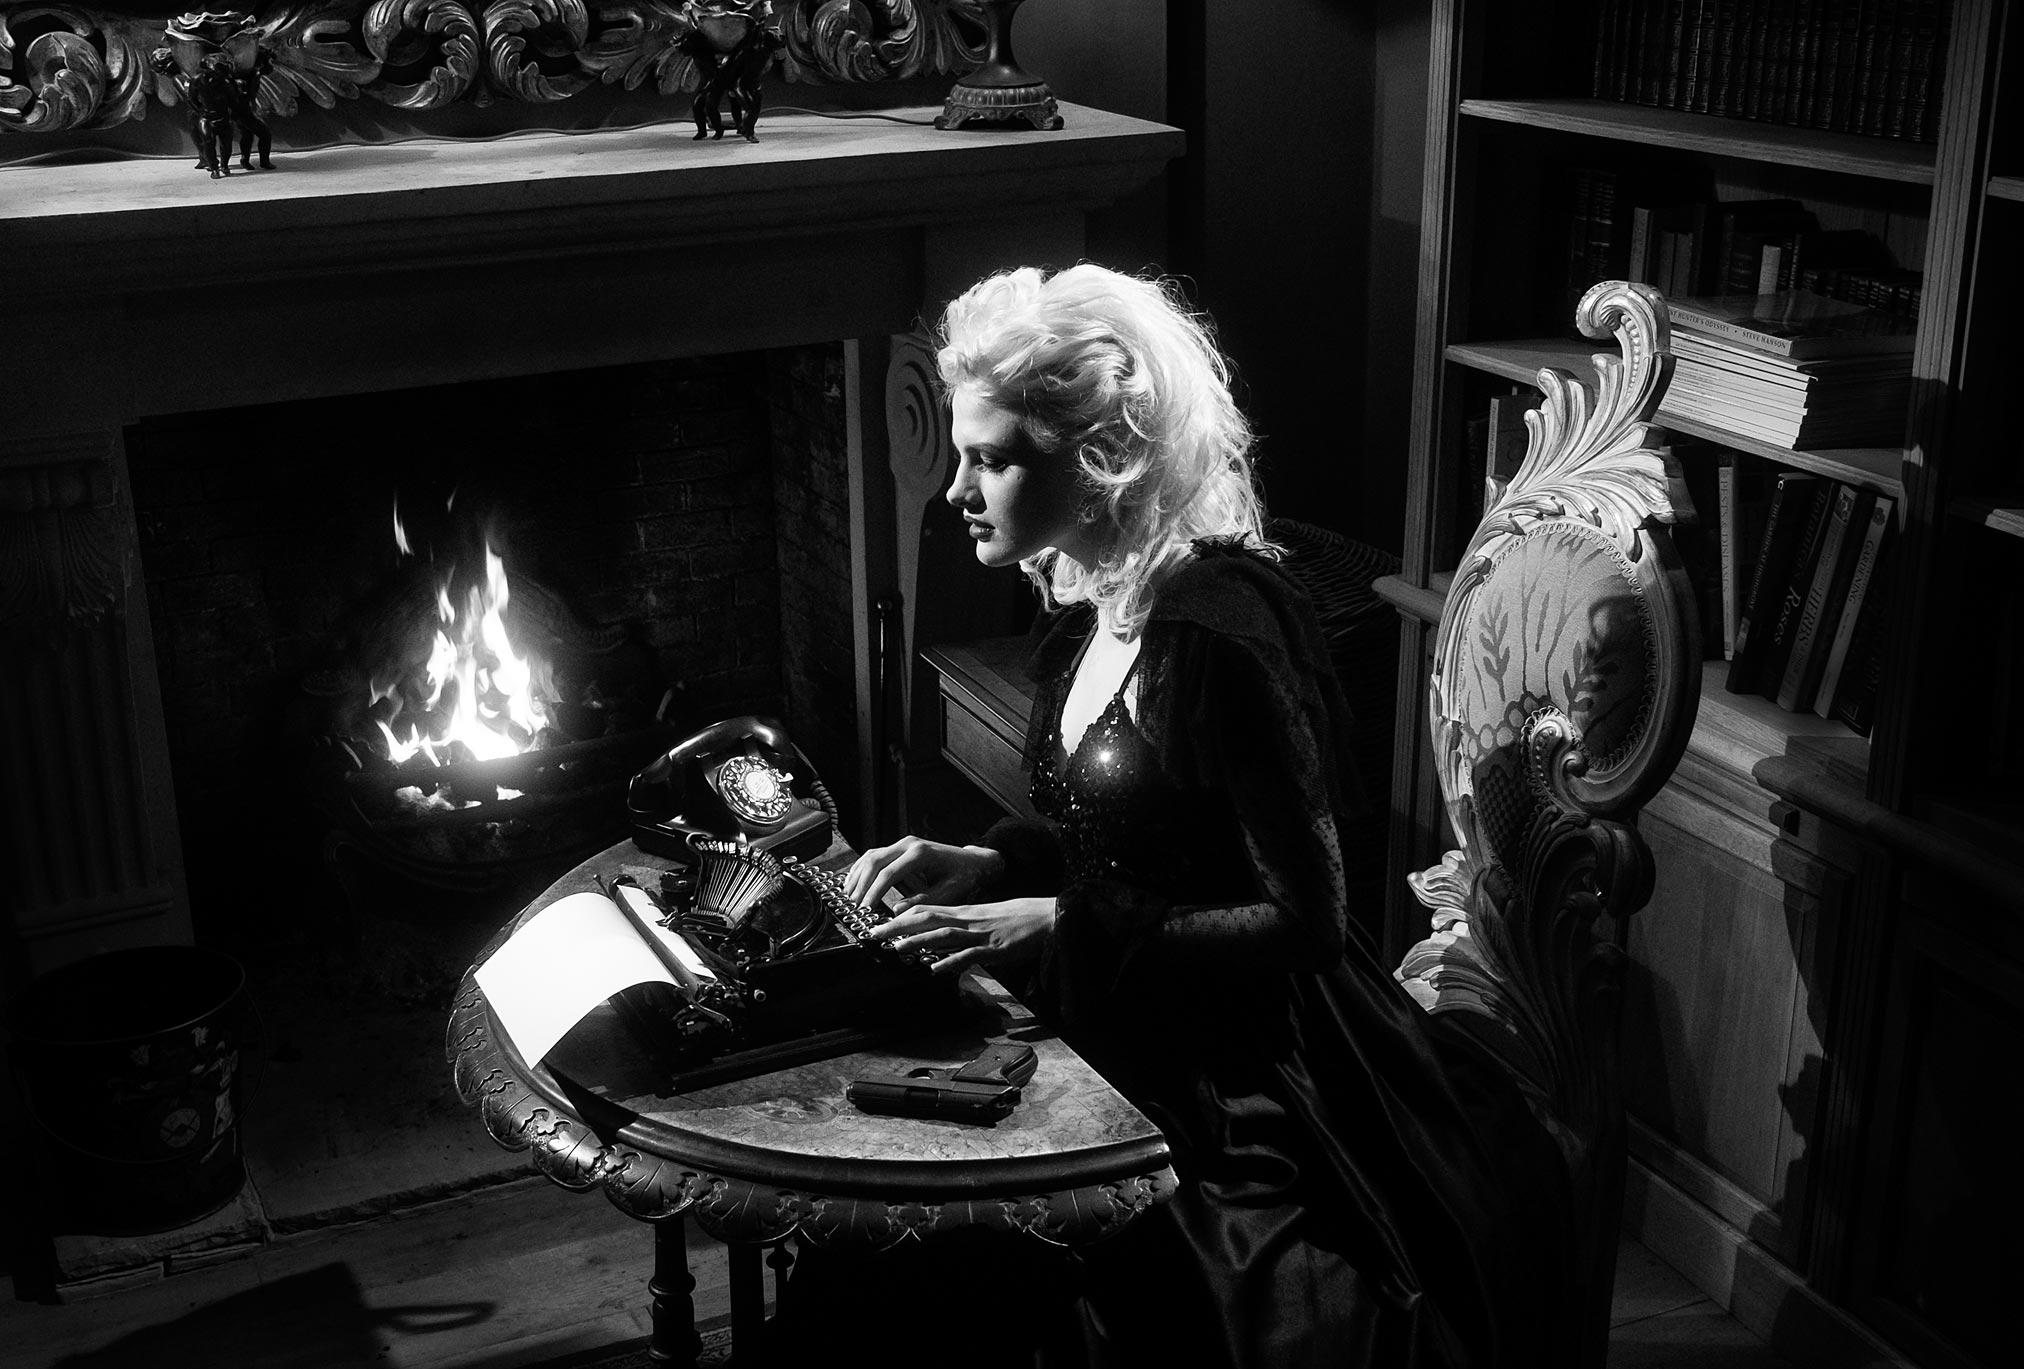 Chloe-Jasmine Whichello by a fireside with a gun